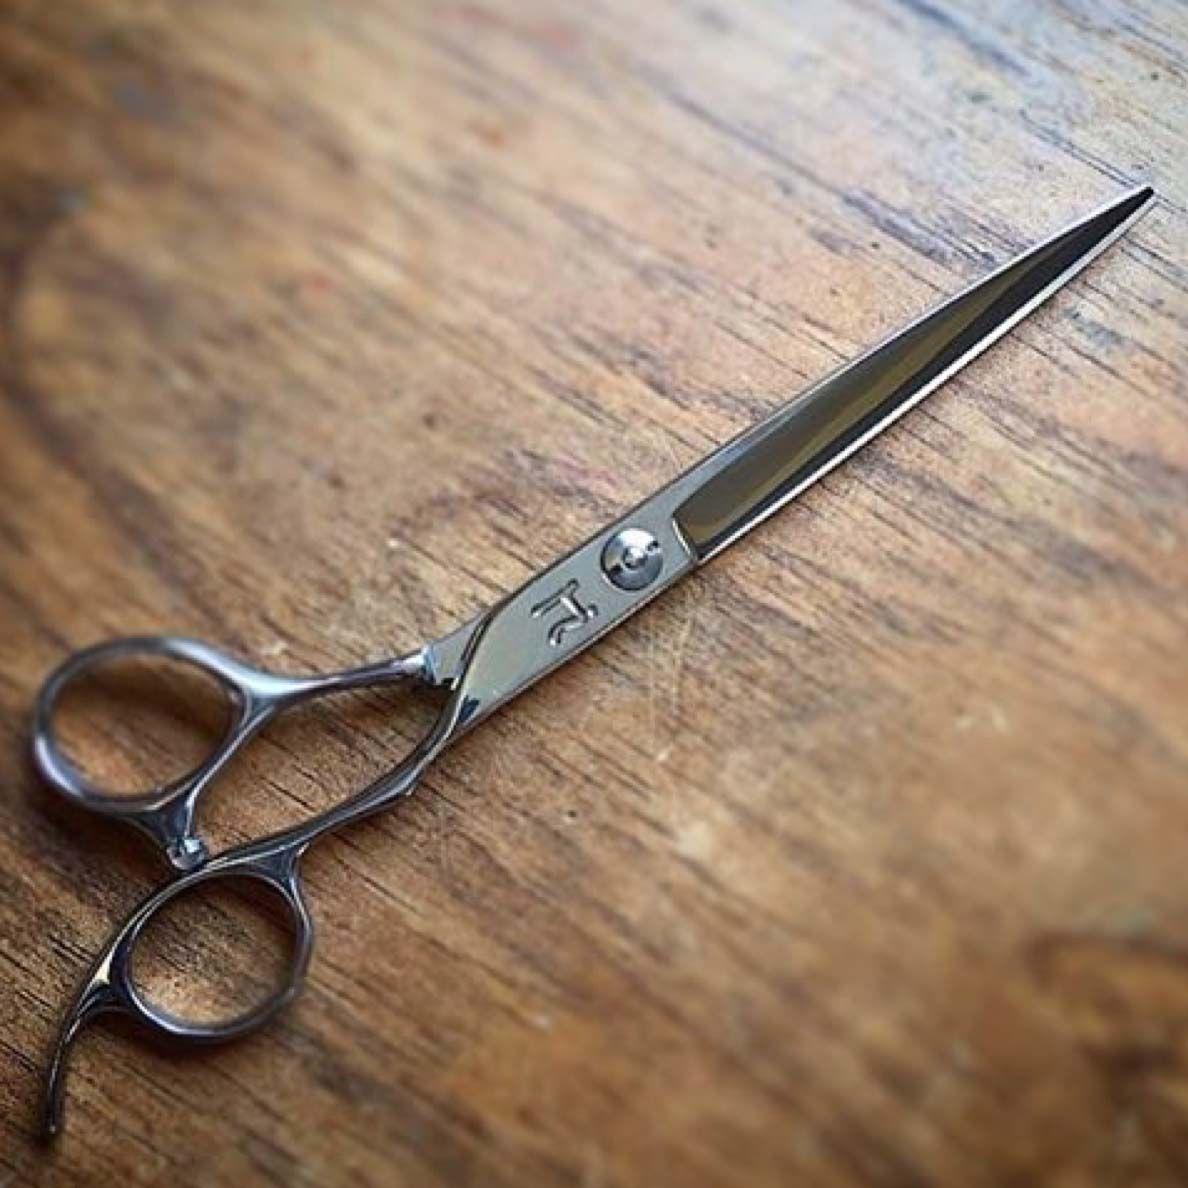 Pin on Shears